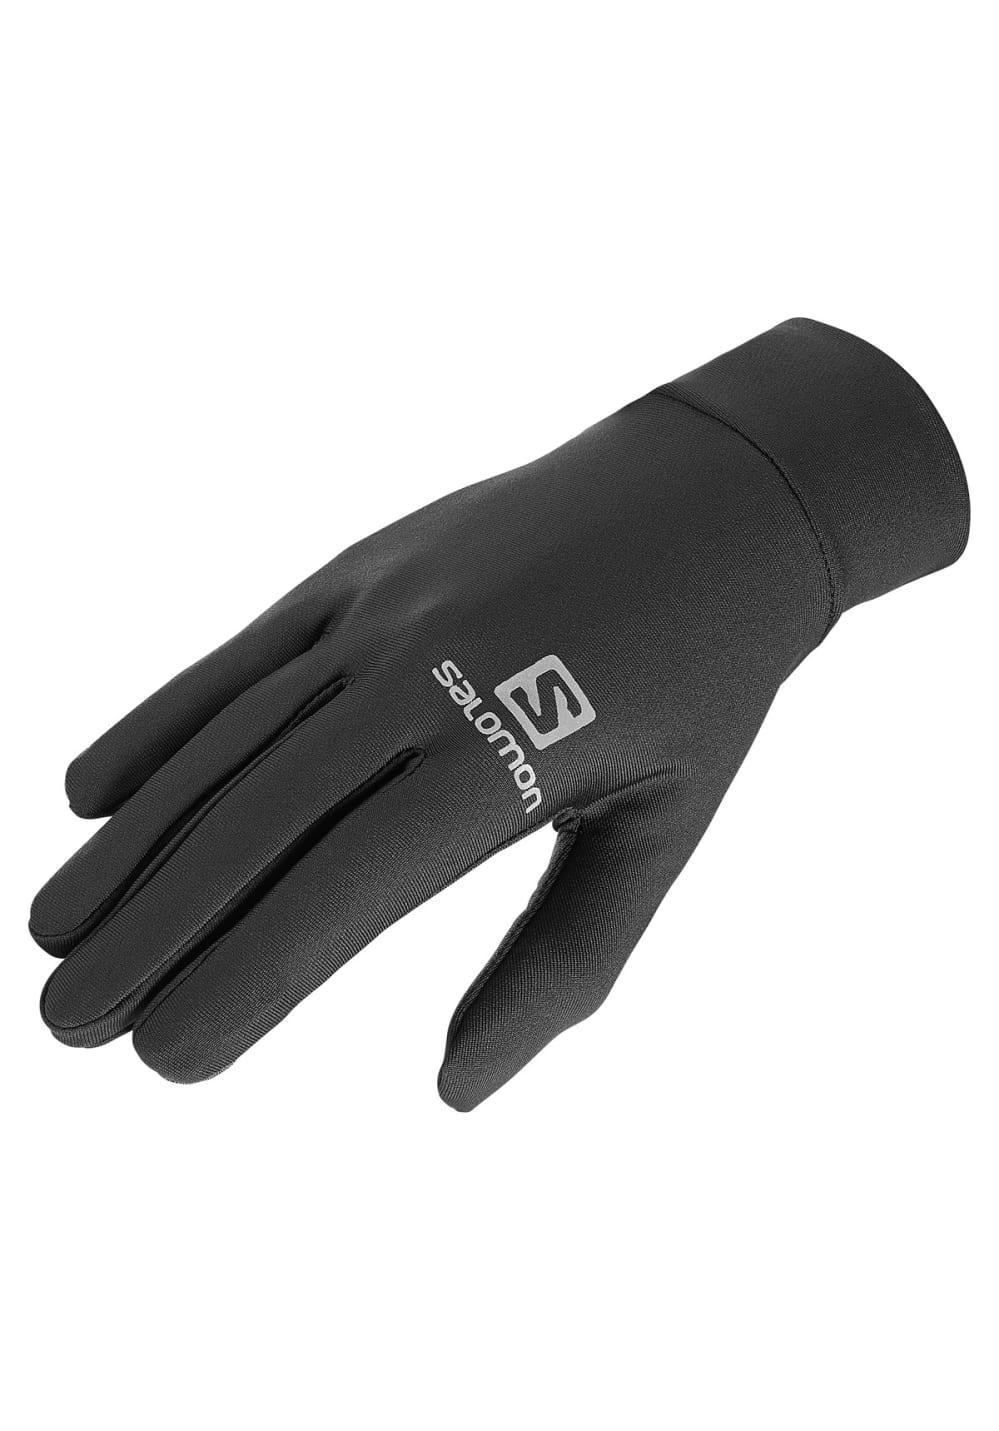 Salomon Agile Warm Glove Laufhandschuhe - Schwarz, Gr. S